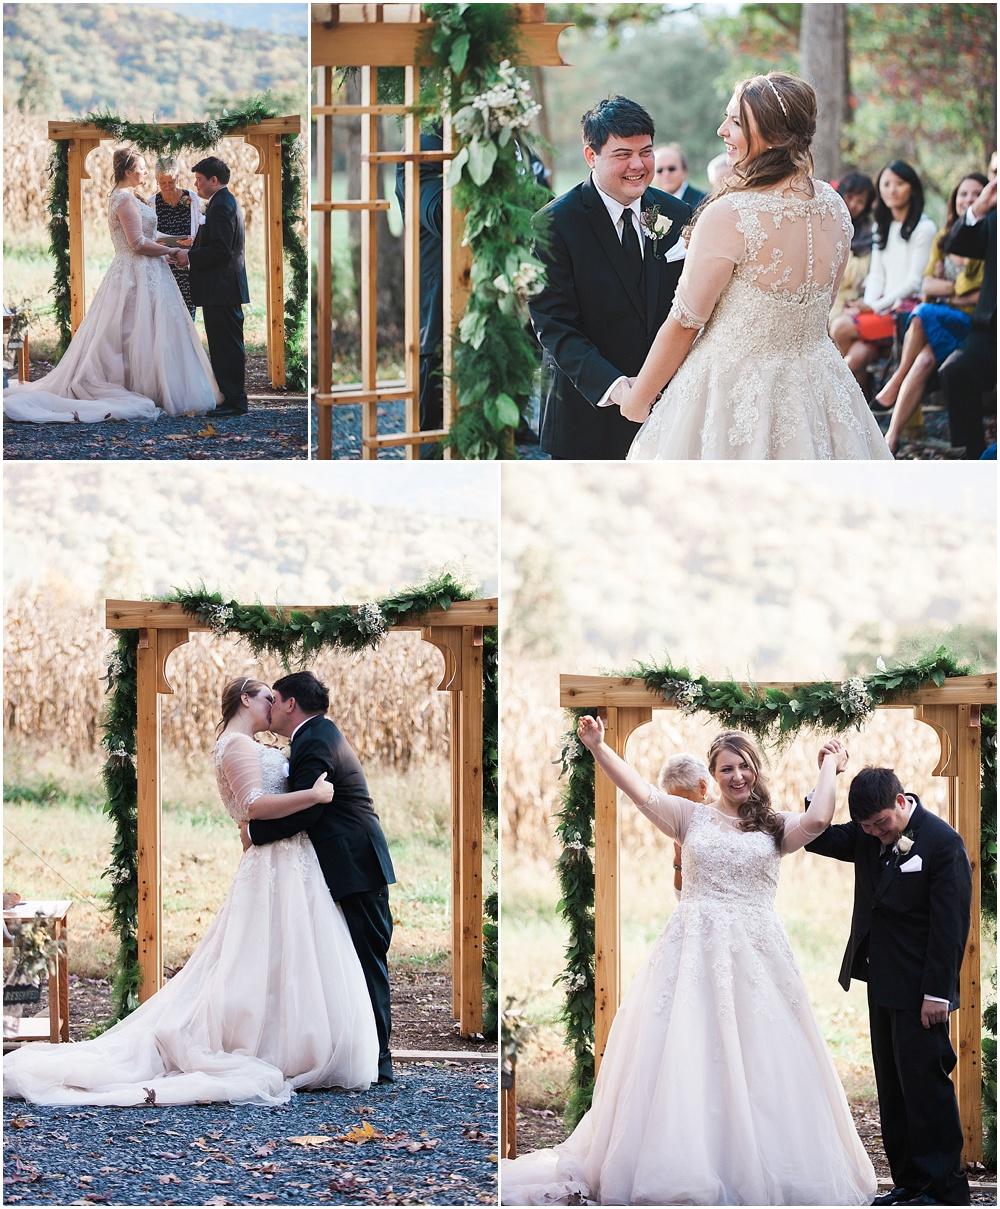 shenandoah_woods_wedding_october_virginia_14